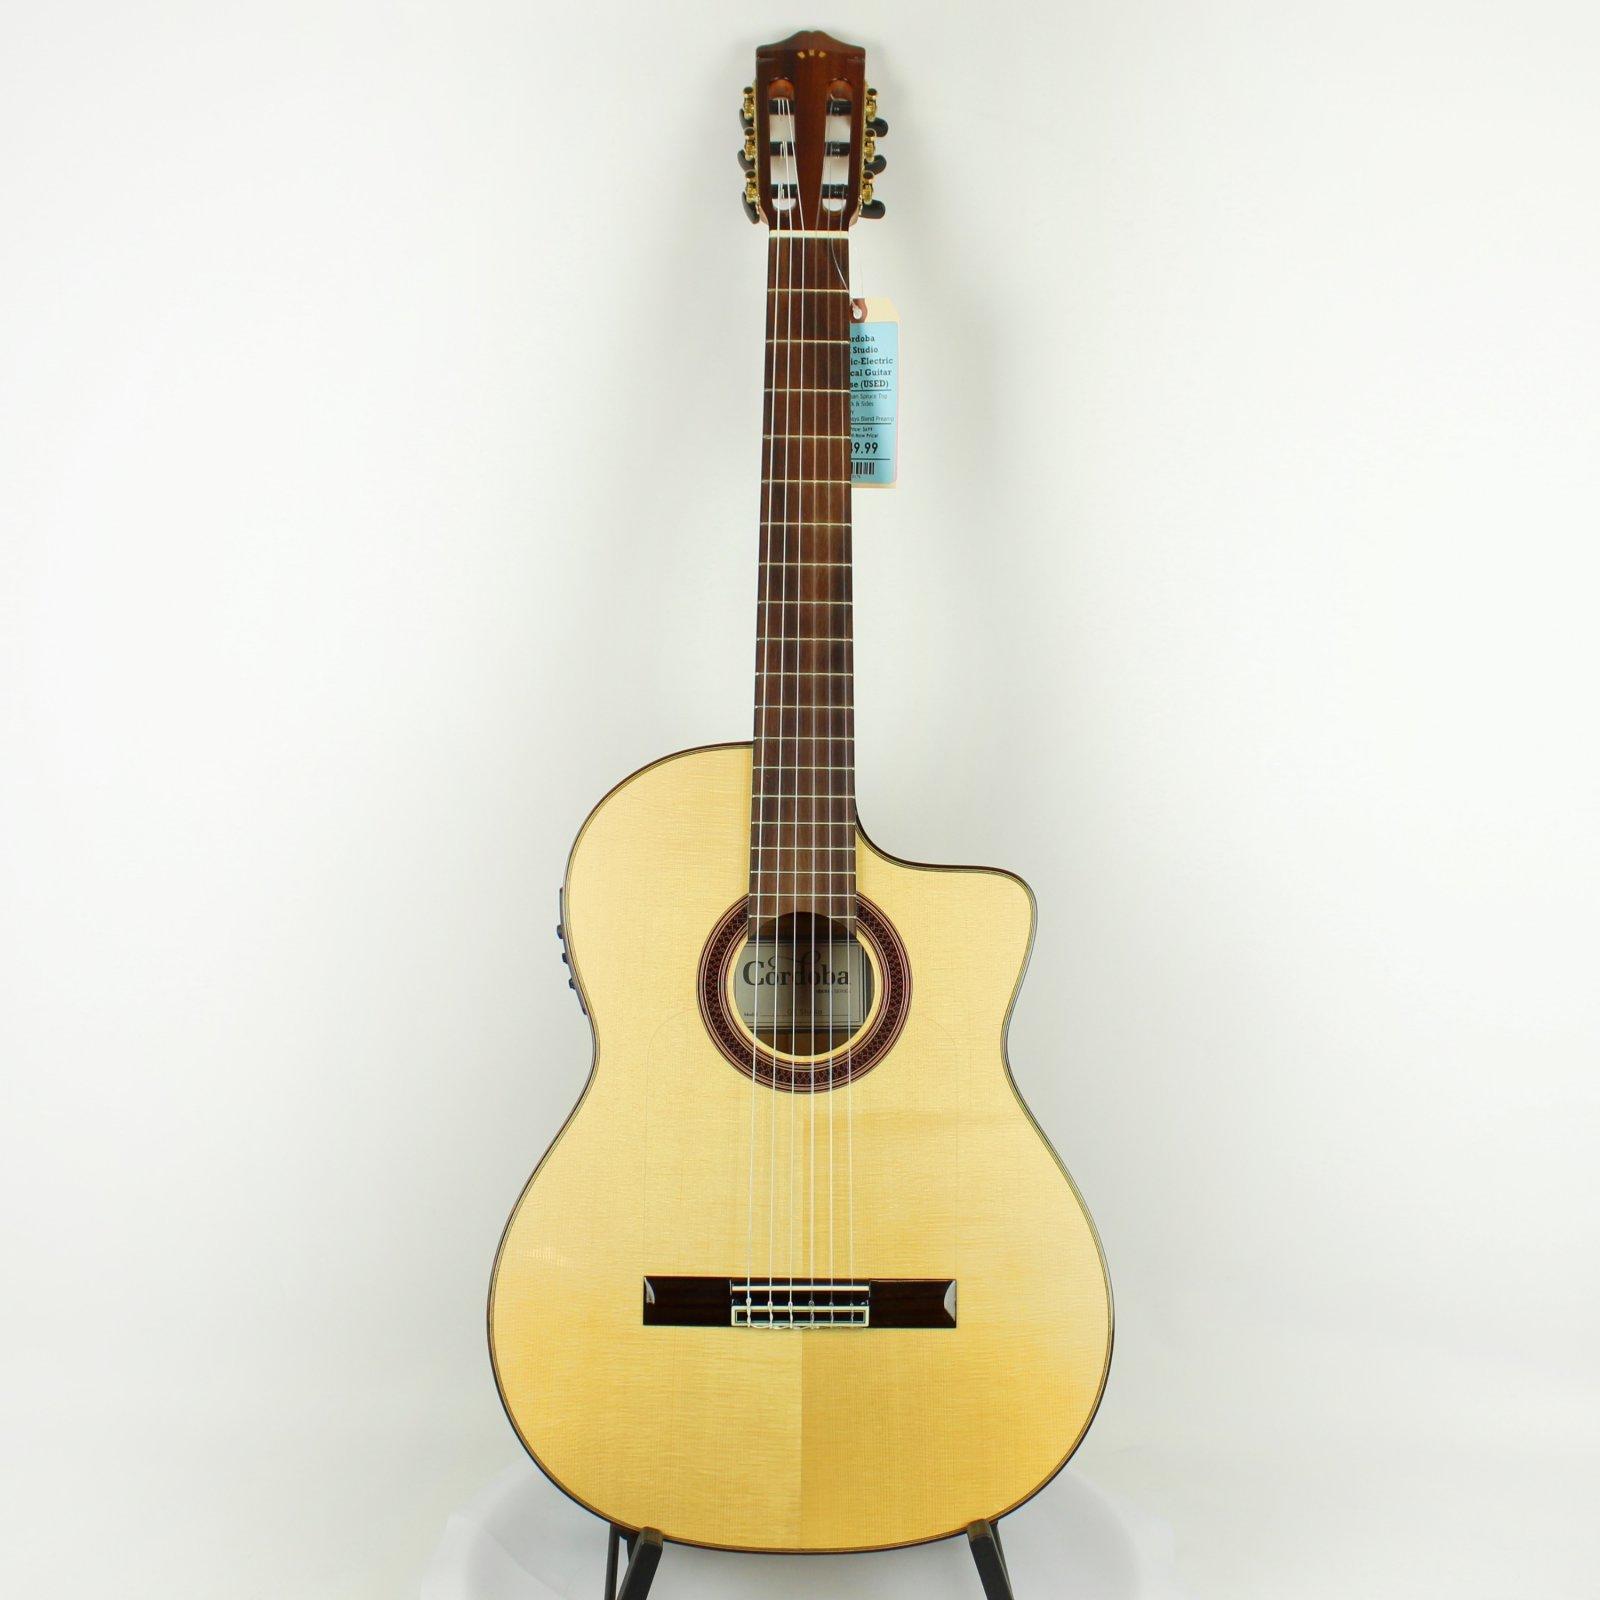 Cordoba Iberia Series GK Studio Acoustic-Electric Cutaway Classical Guitar w/ Gig-Bag (USED)